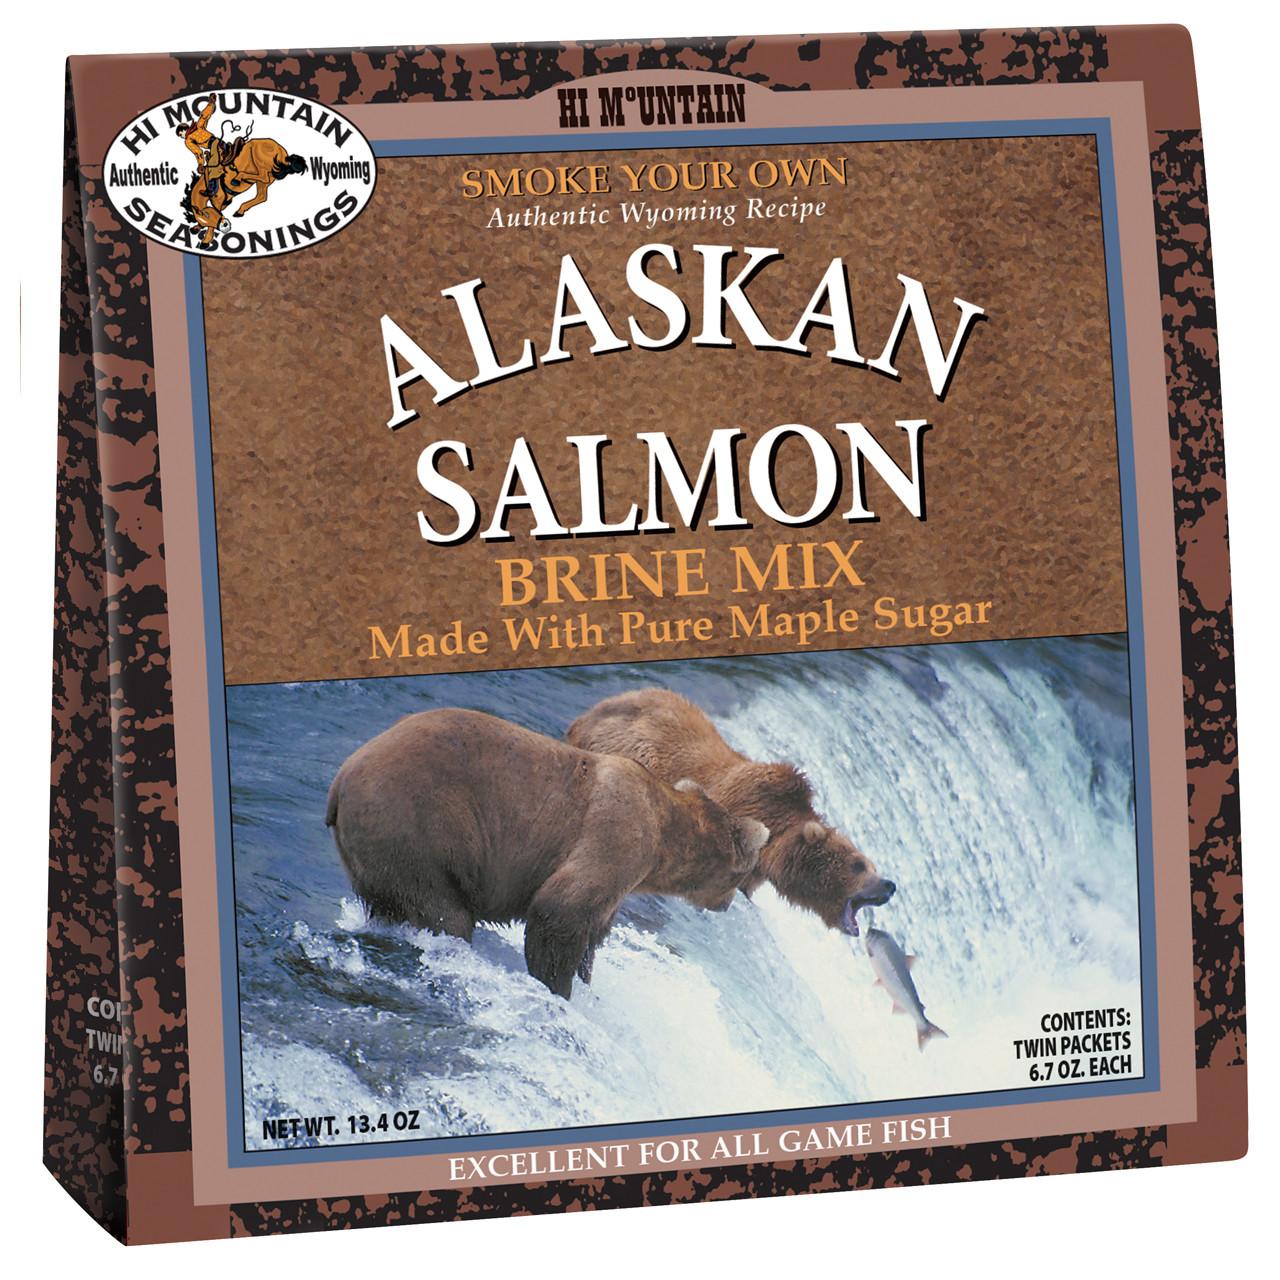 Alaskan Salmon Brine Mix